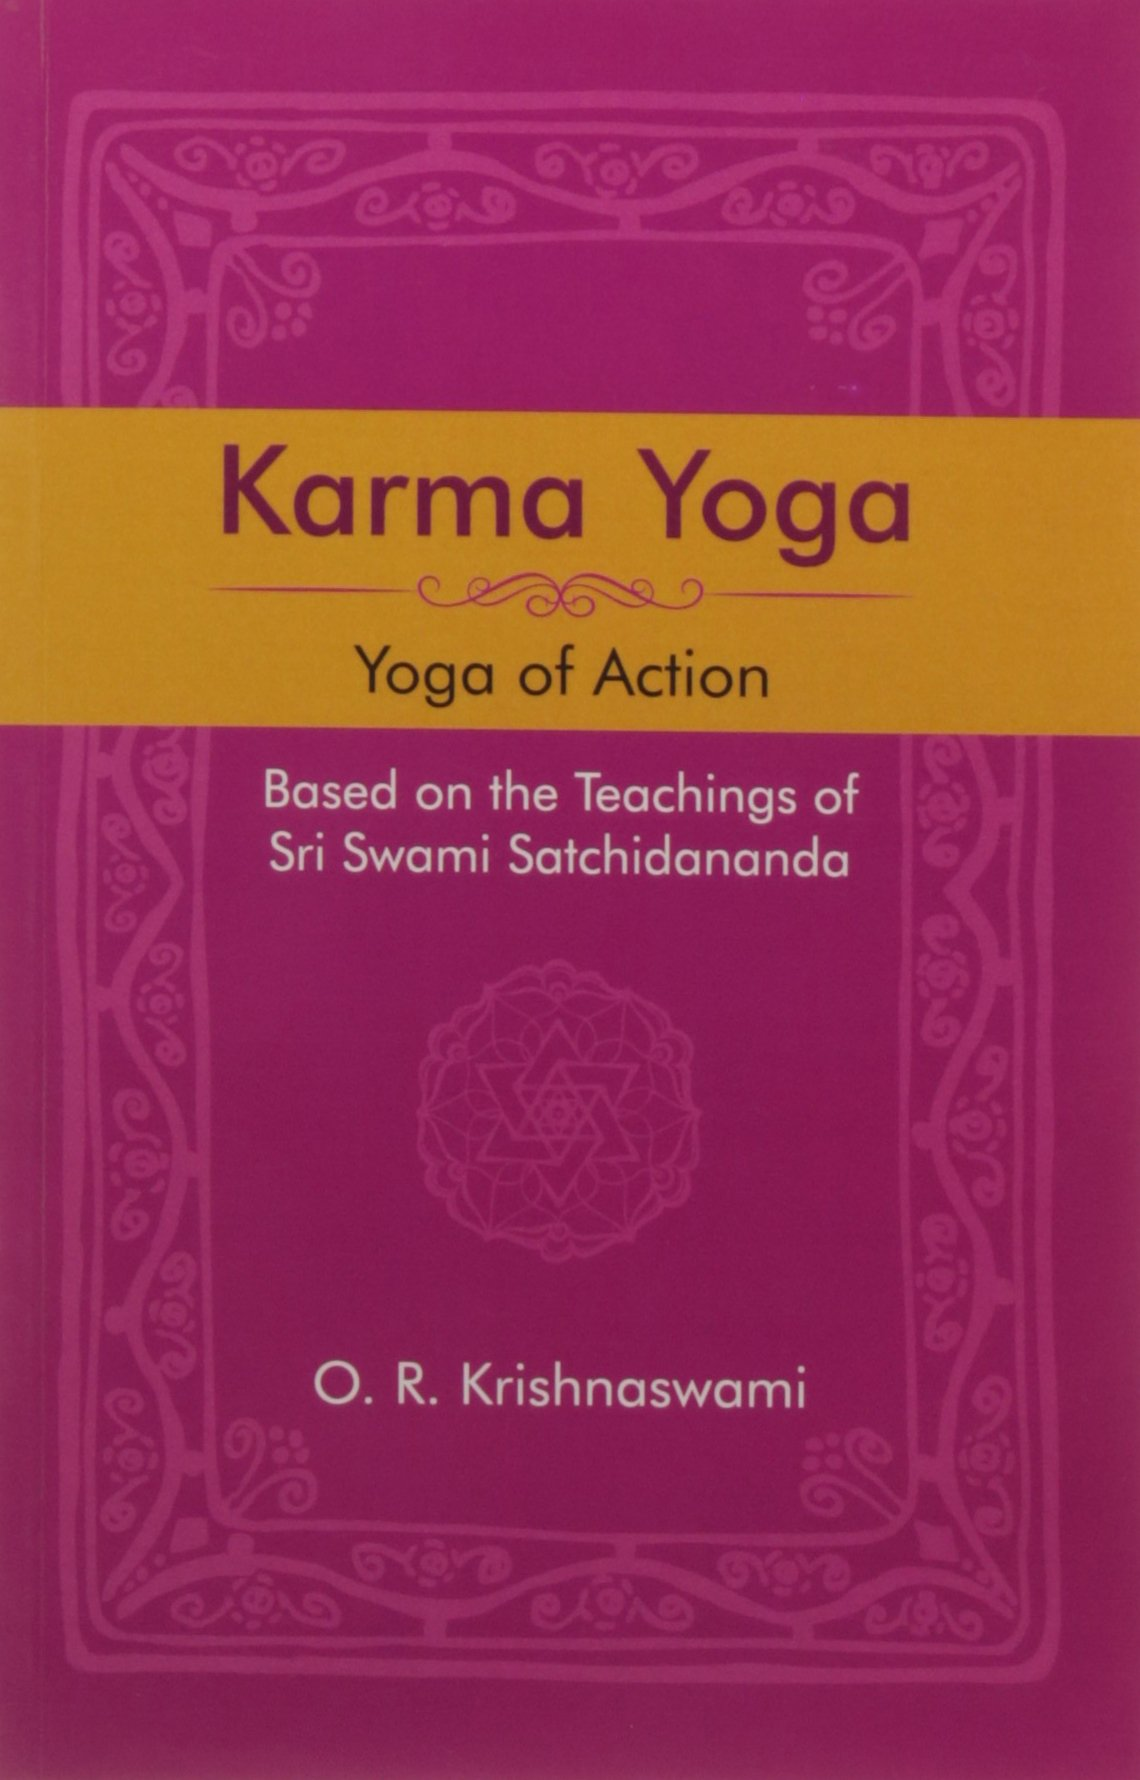 Karma Yoga: Yoga of Action, Based on the Teachings of Sri ...